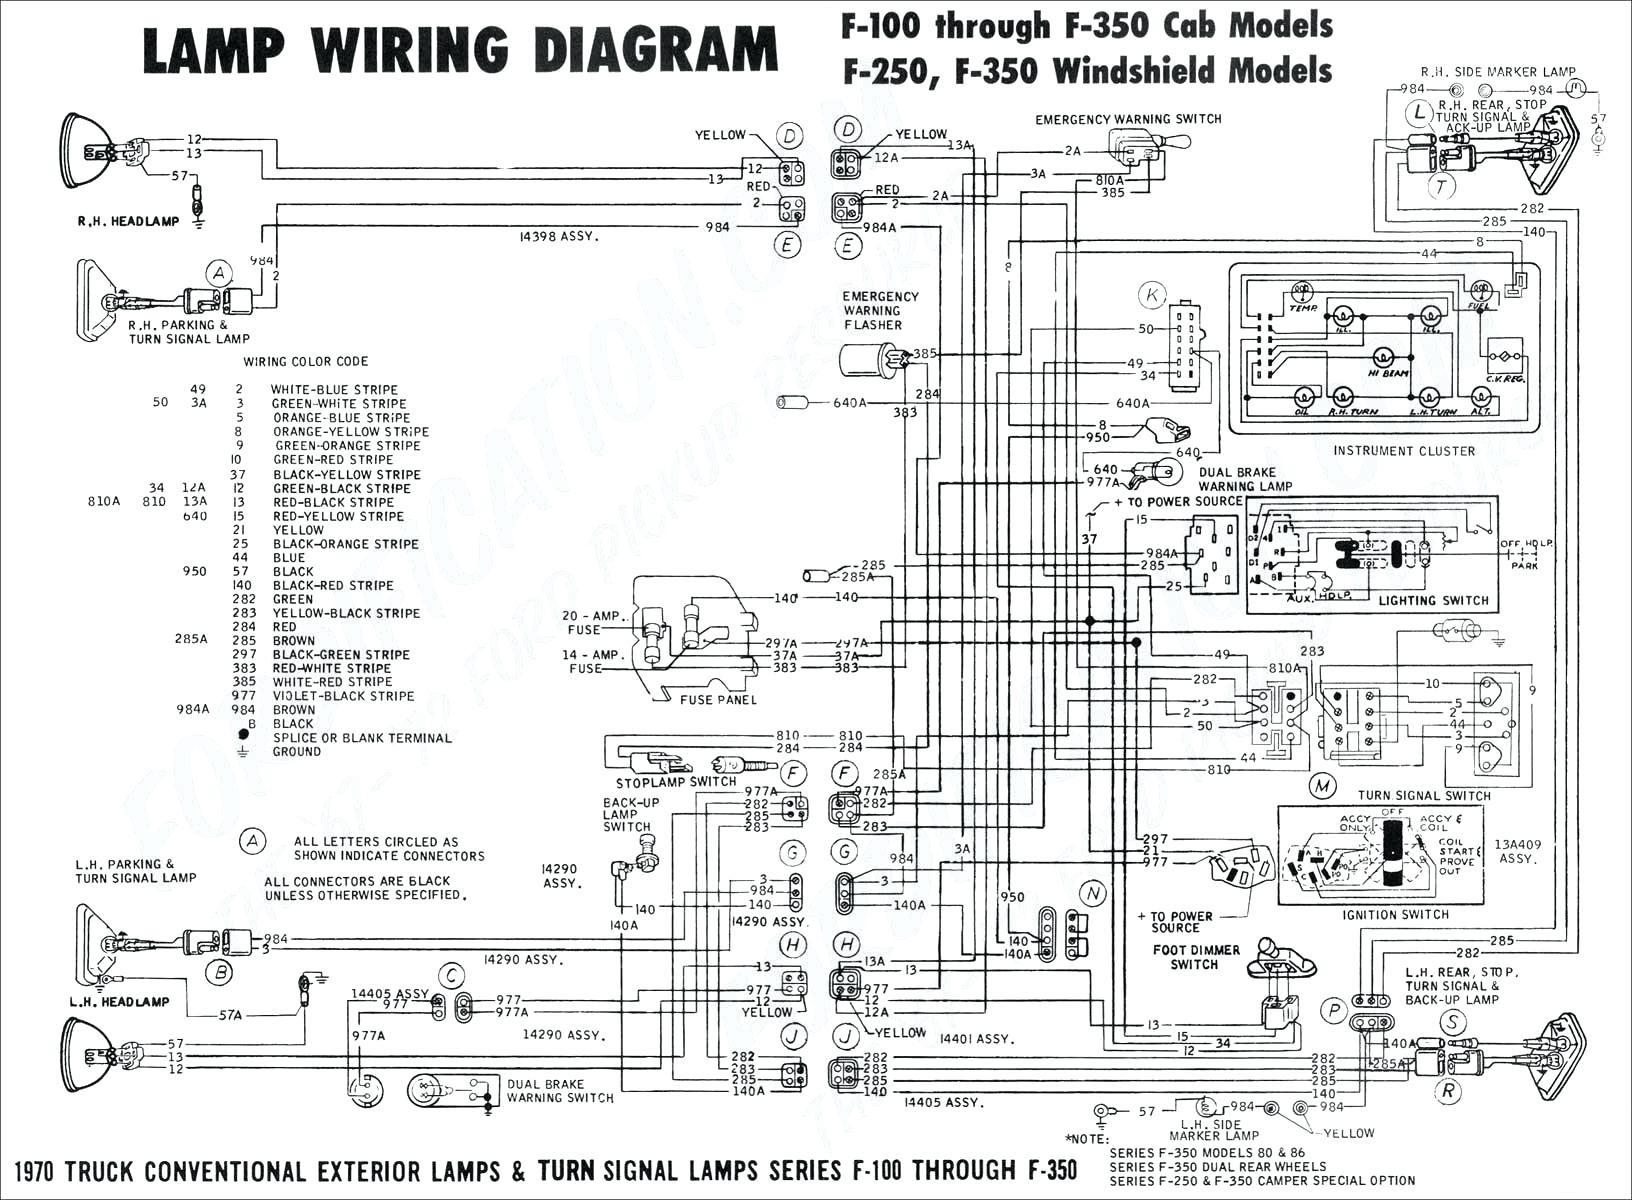 Turn Signal Schematic Diagram